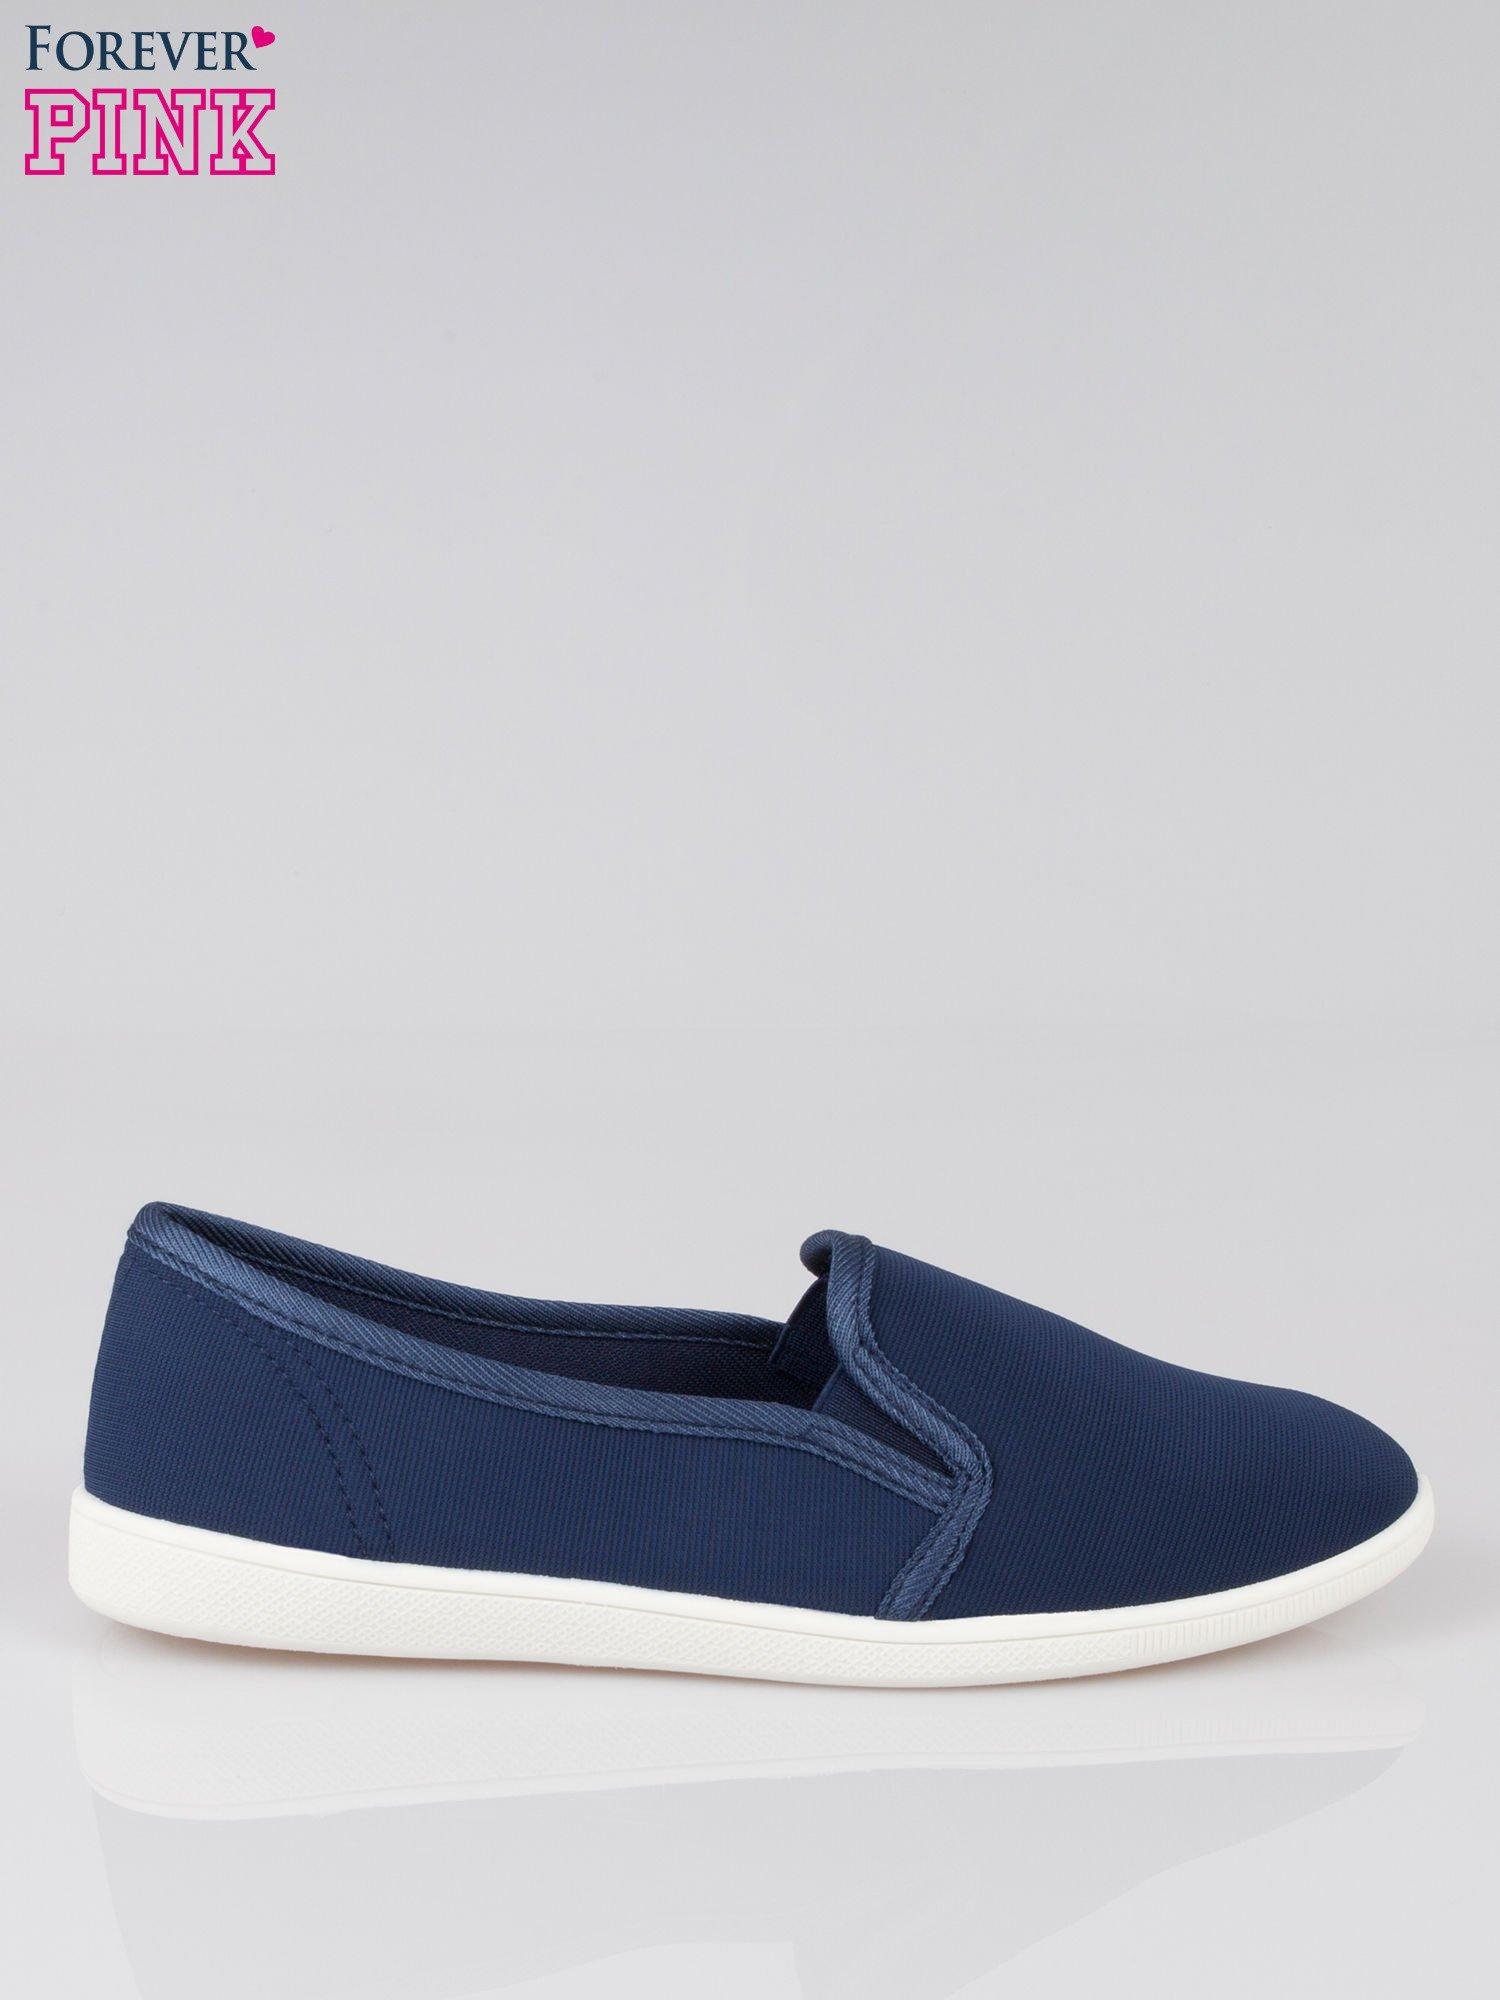 Granatowe lekkie buty sliponki                                  zdj.                                  1